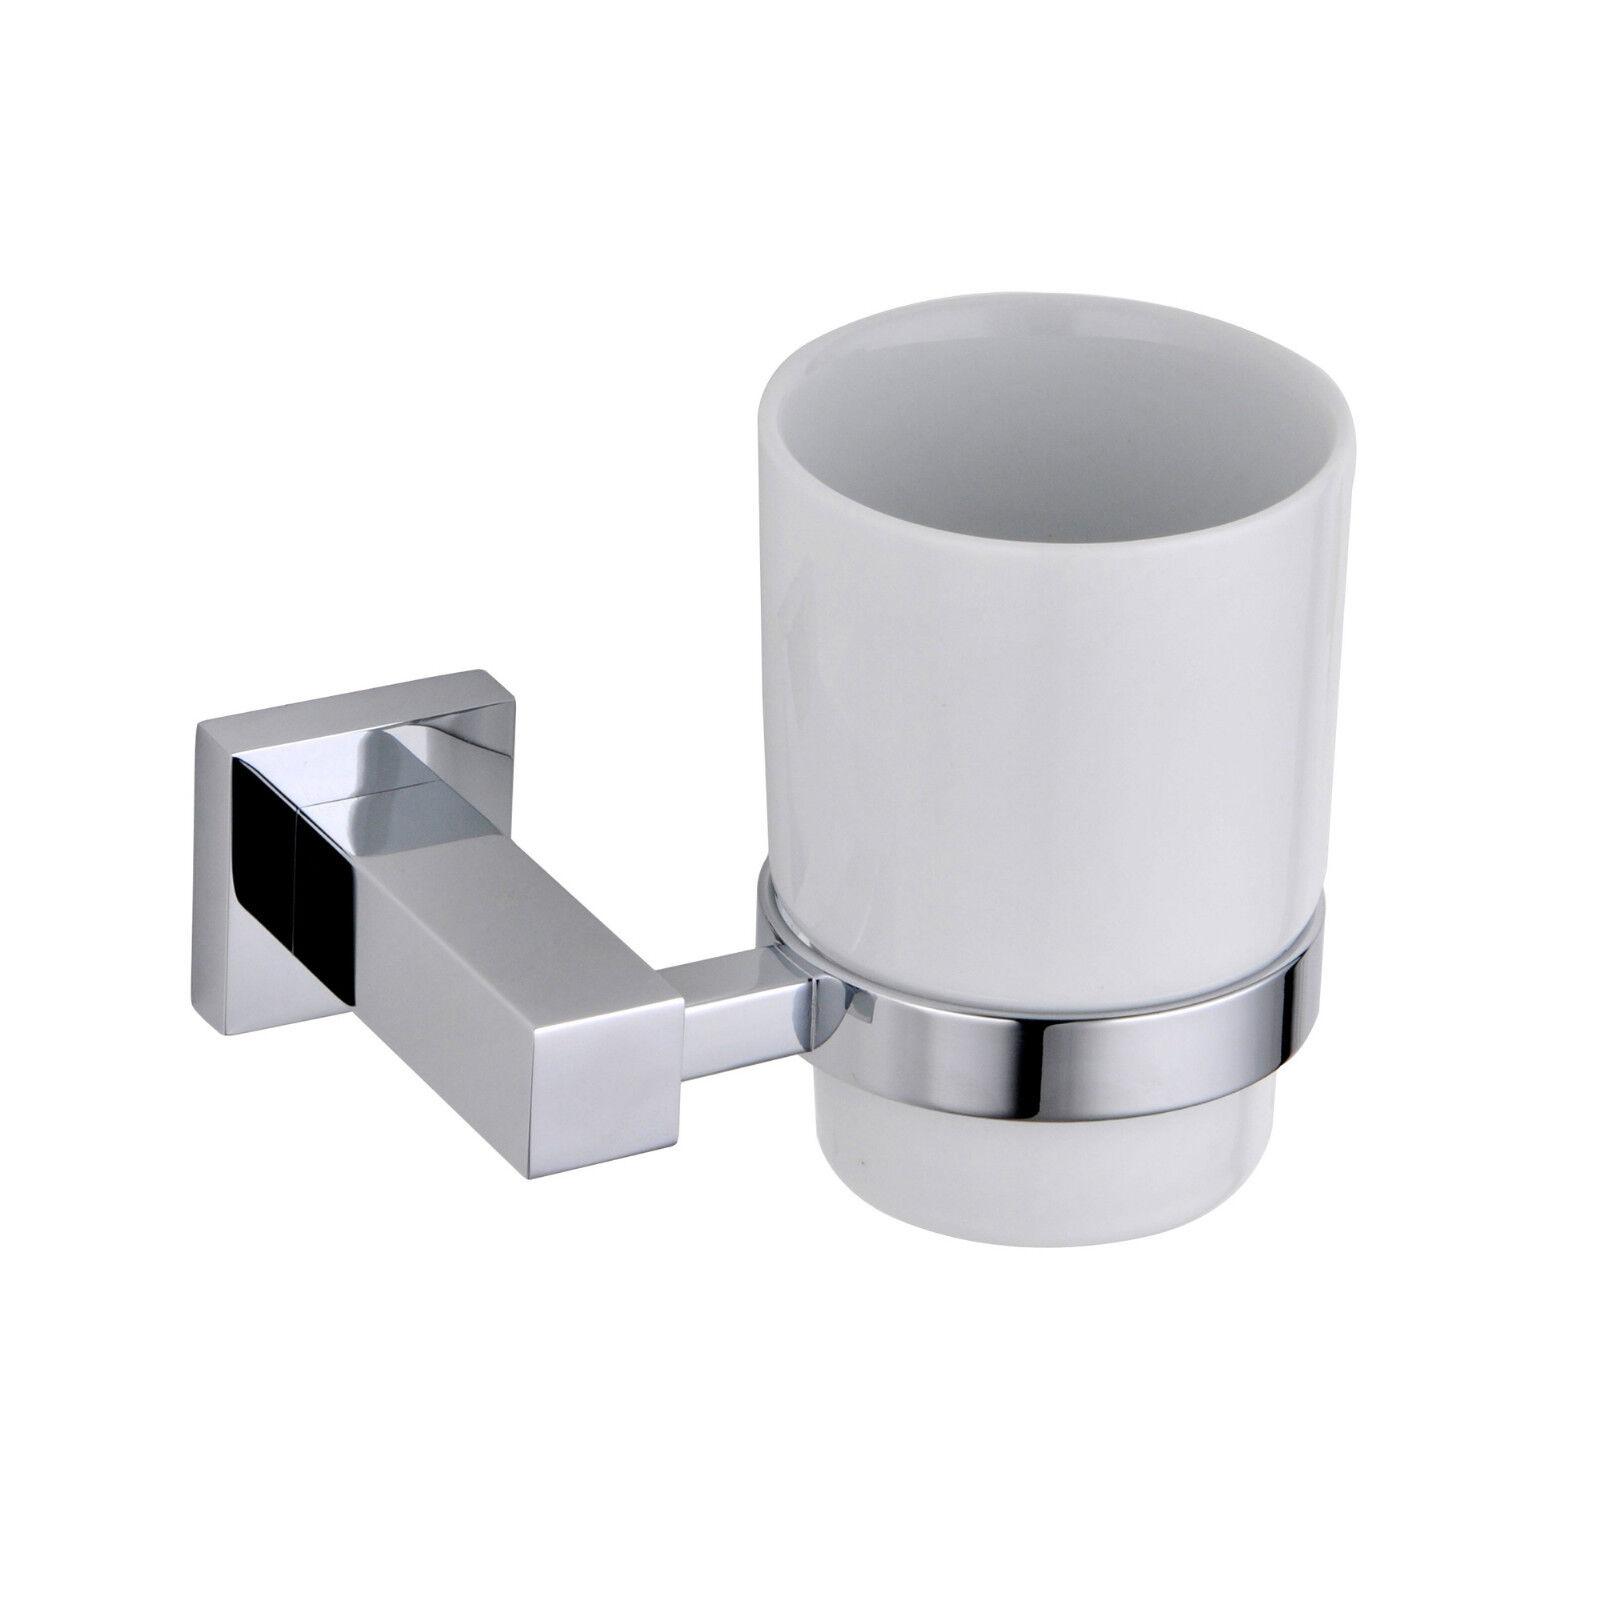 square chrome bathroom accessories square chrome bathroom accessories single tumbler ebay